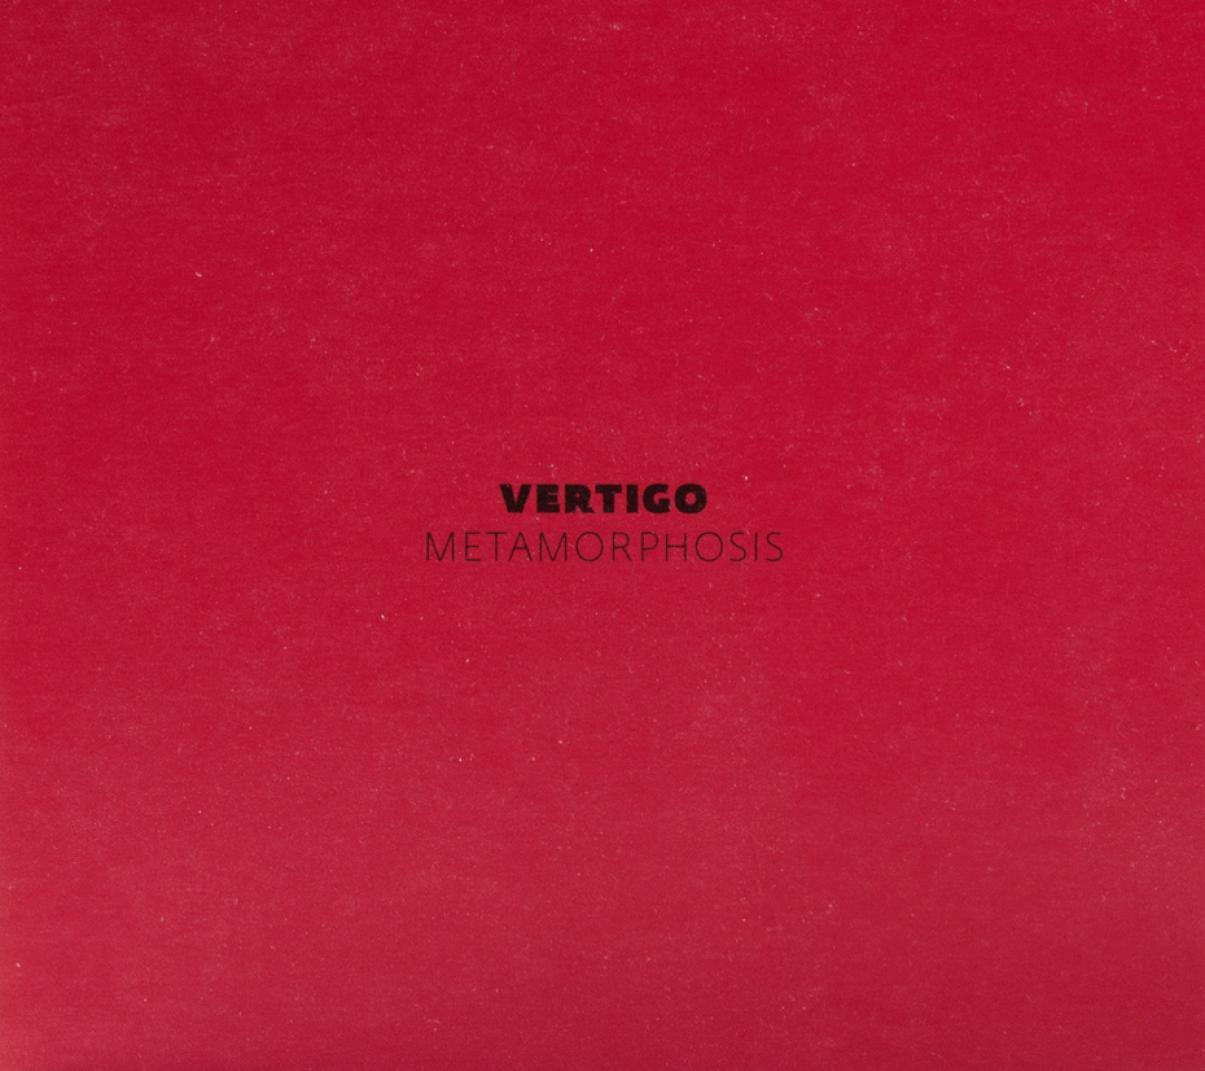 Vertigo: Metamorphosis